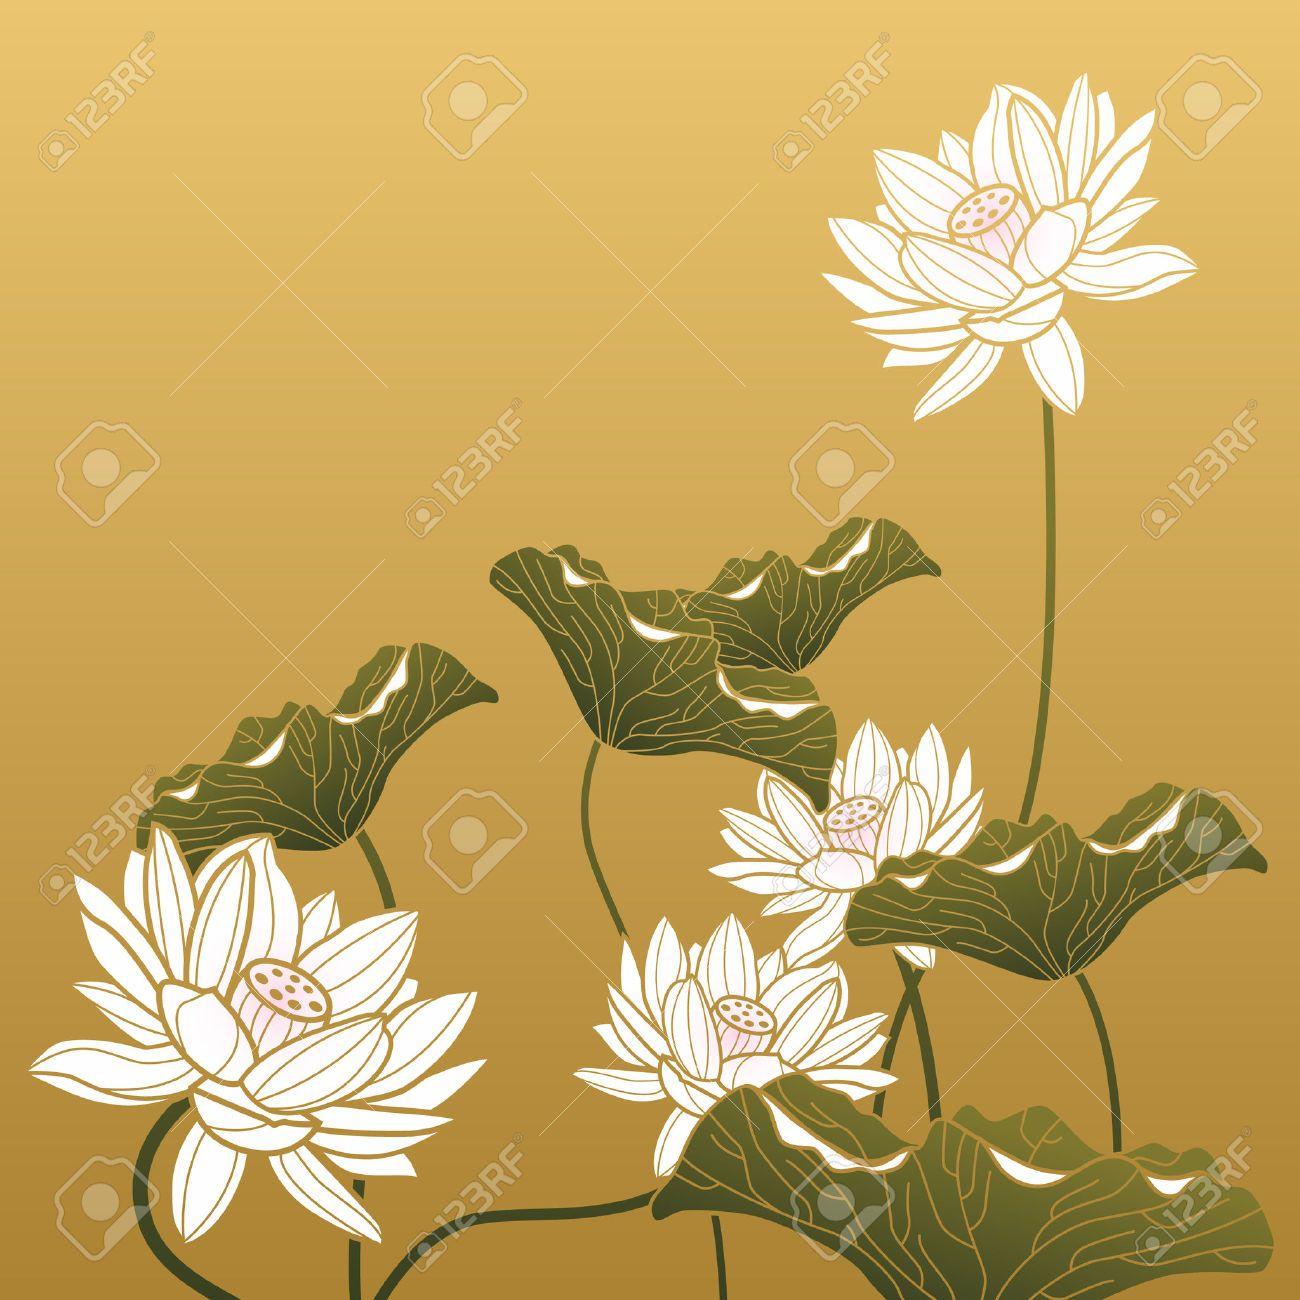 43460847 traditional chinese art stock vector lotus flower chinese 43460847 traditional chinese art stock vector lotus flower izmirmasajfo